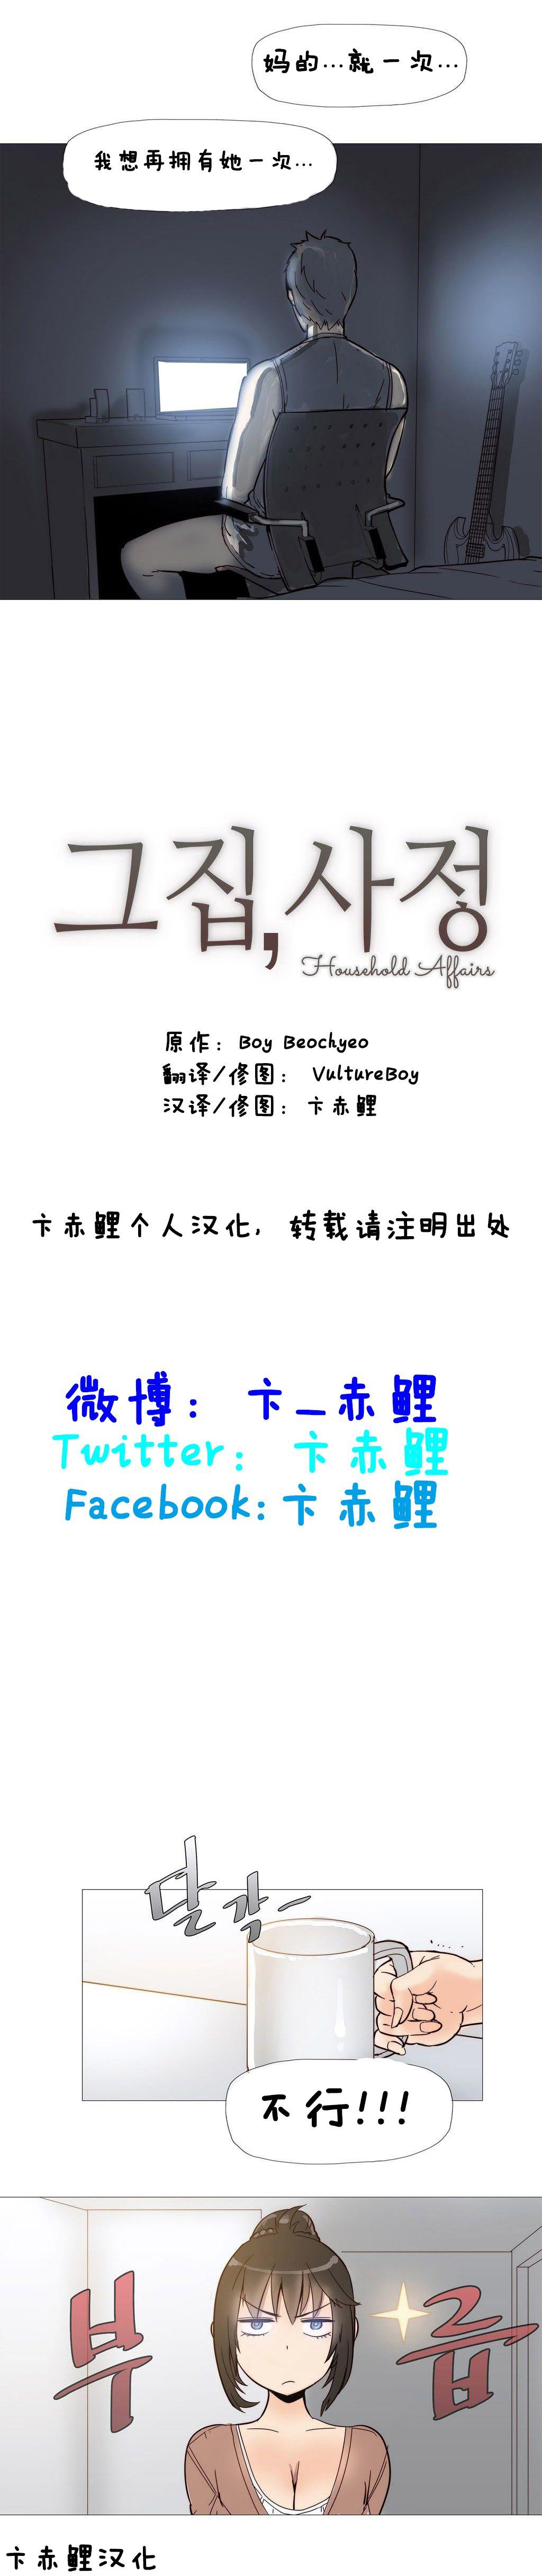 HouseHold Affairs 【卞赤鲤个人汉化】1~33话(持续更新中) 57